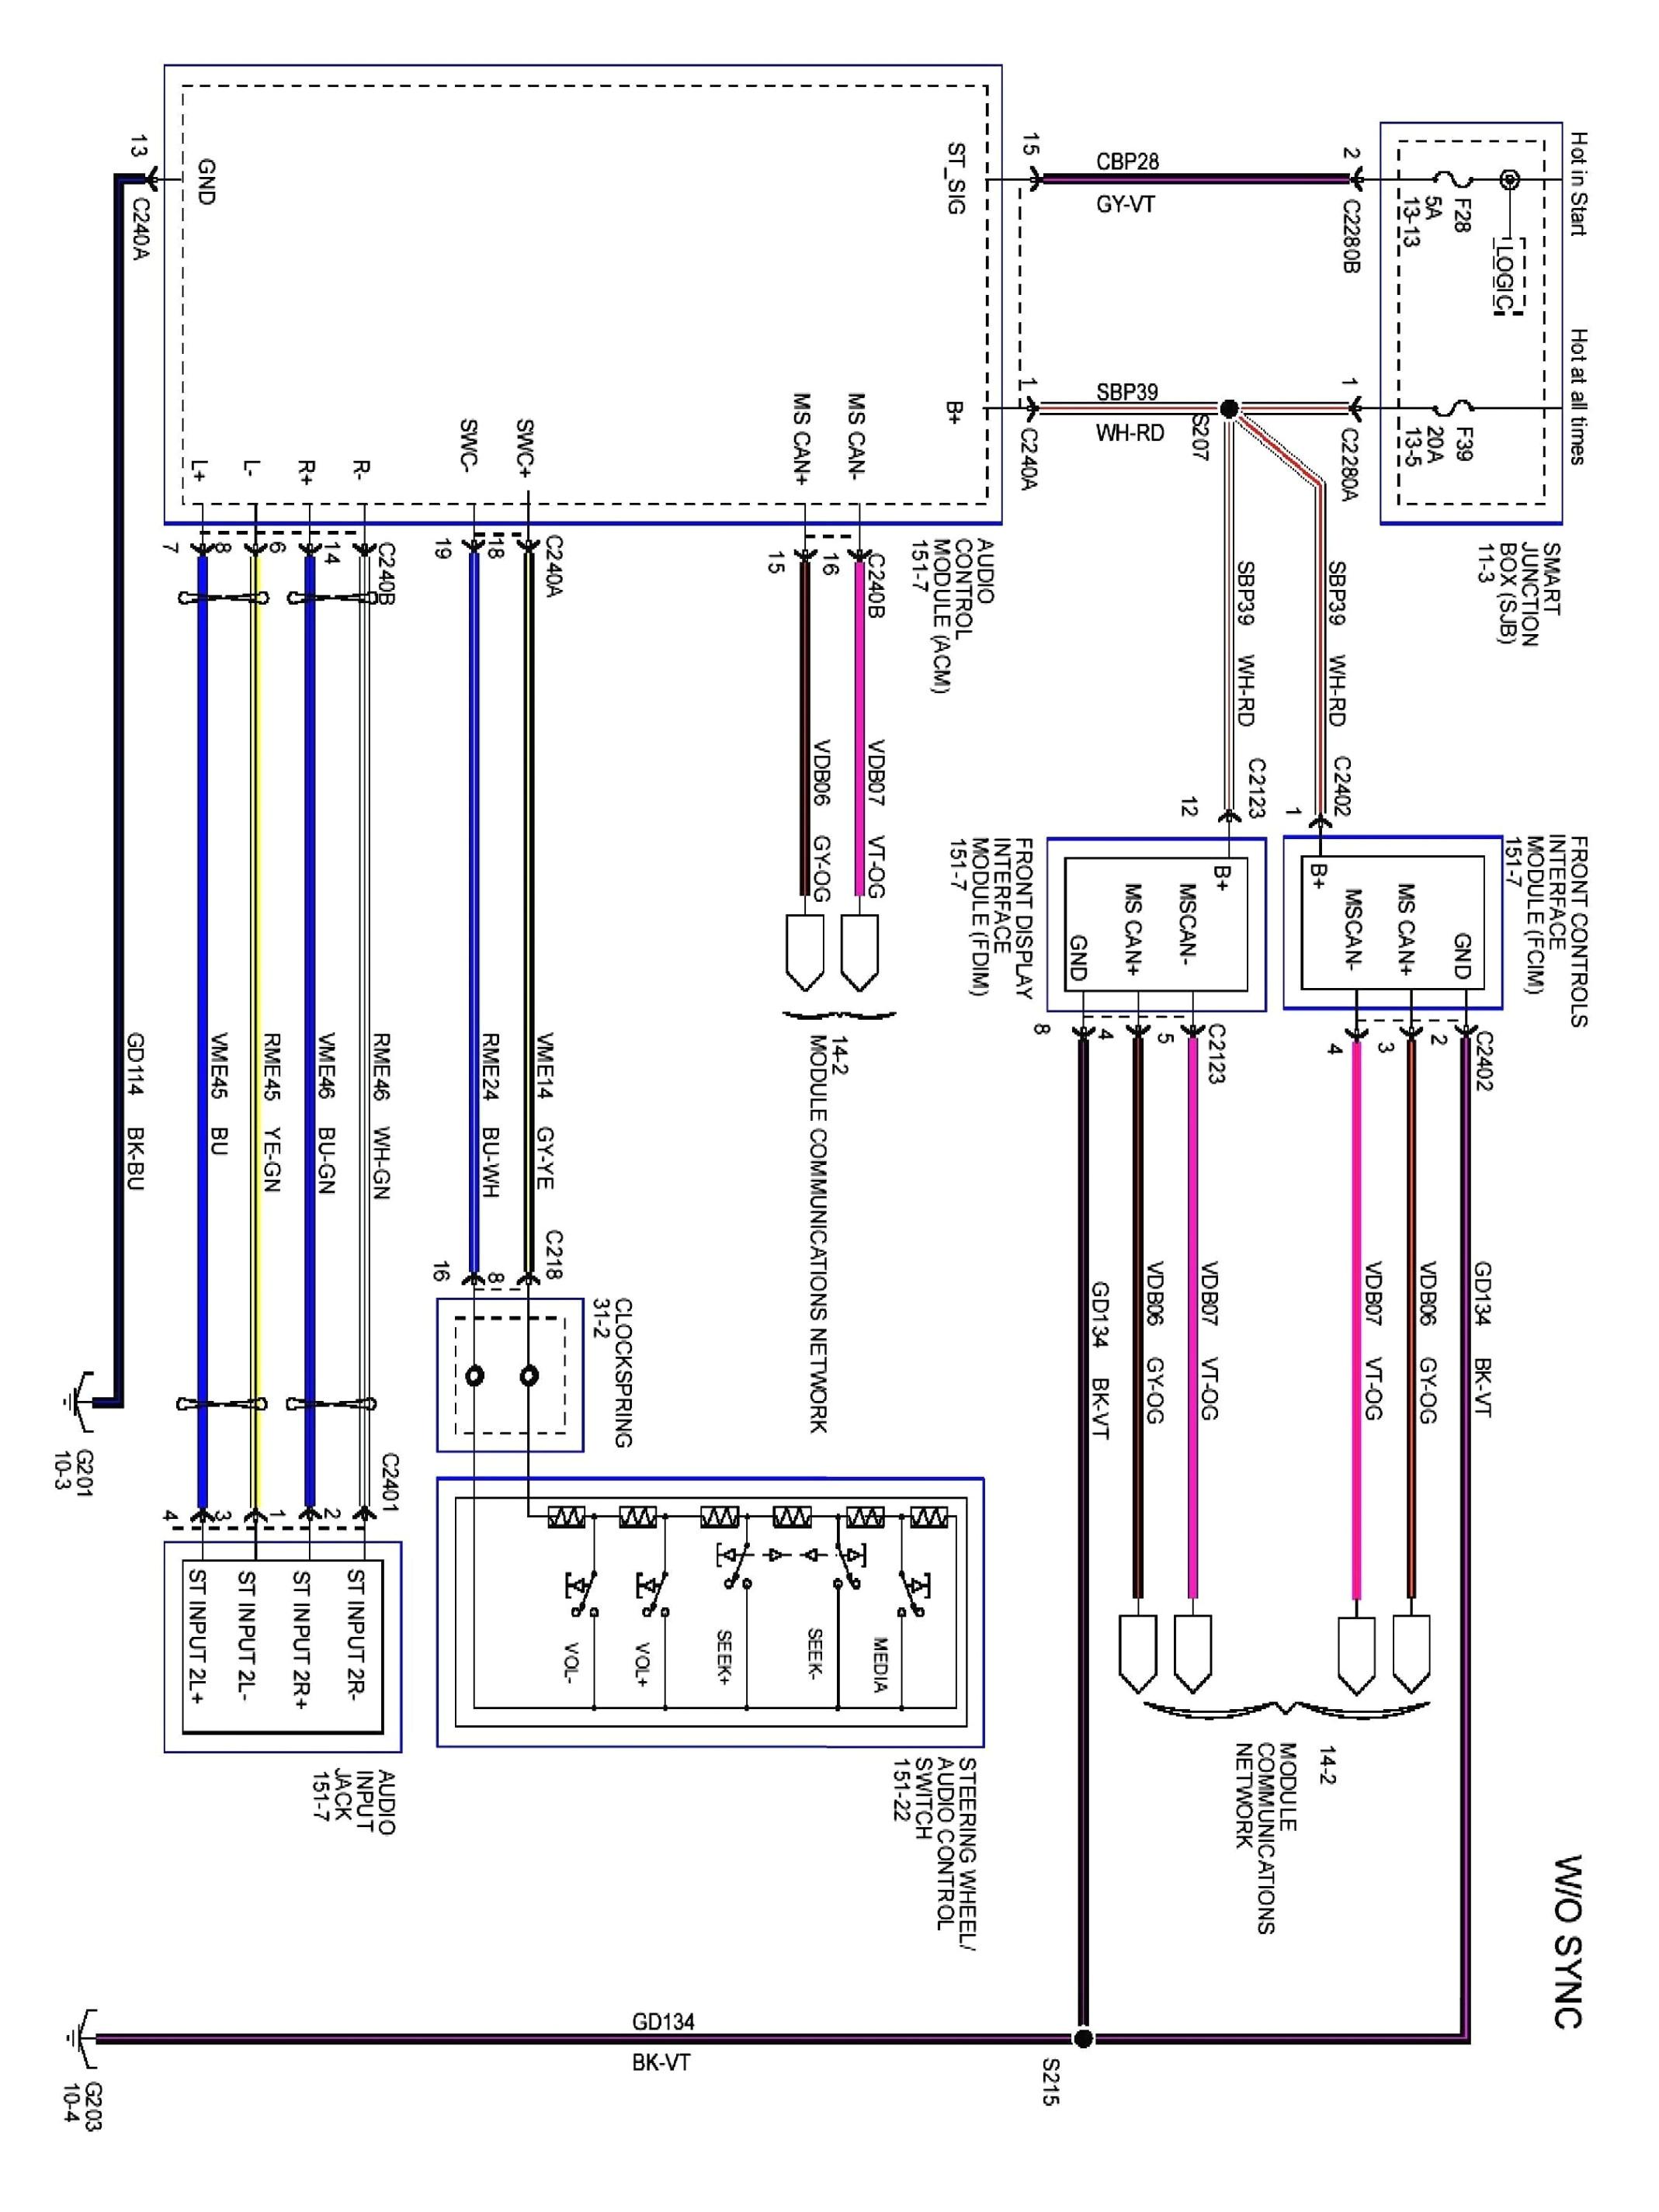 Bmw Wiring Diagram Bmw E83 Engine Diagram Blog Wiring Diagram